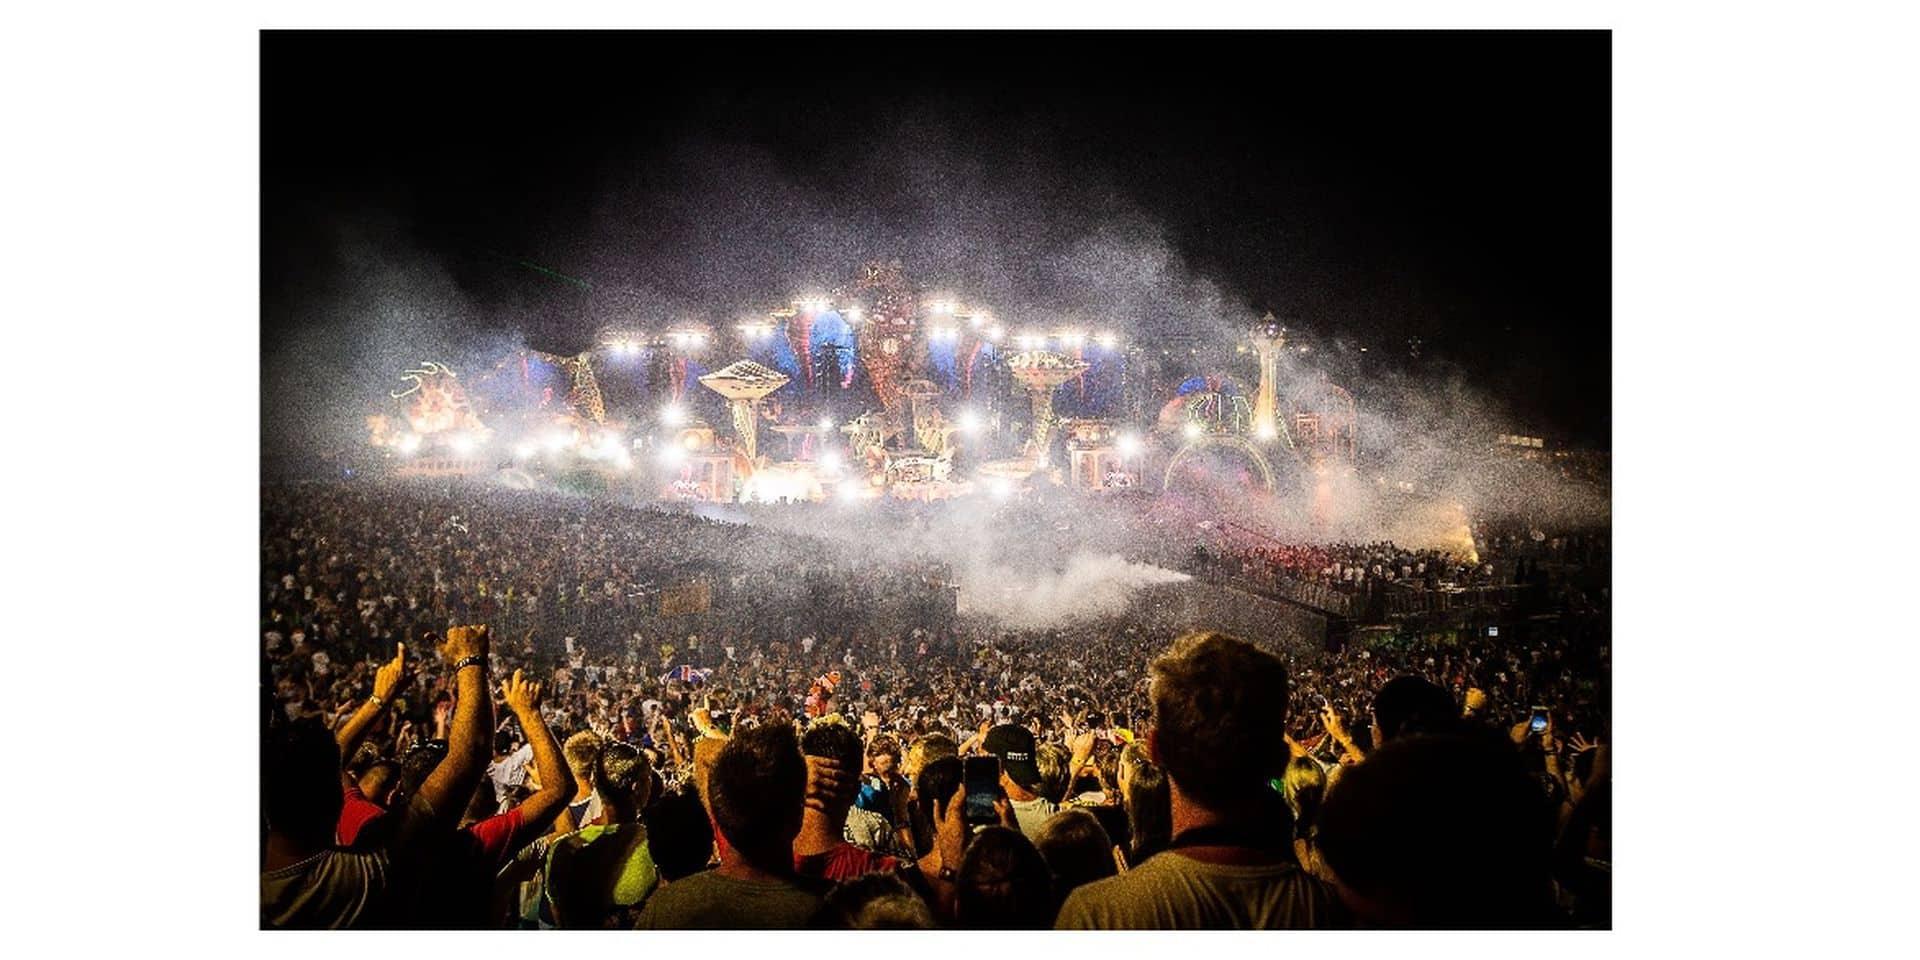 Tomorrowland et British American Tobacco unis : il ne s'agira pas d'un festival sans tabac